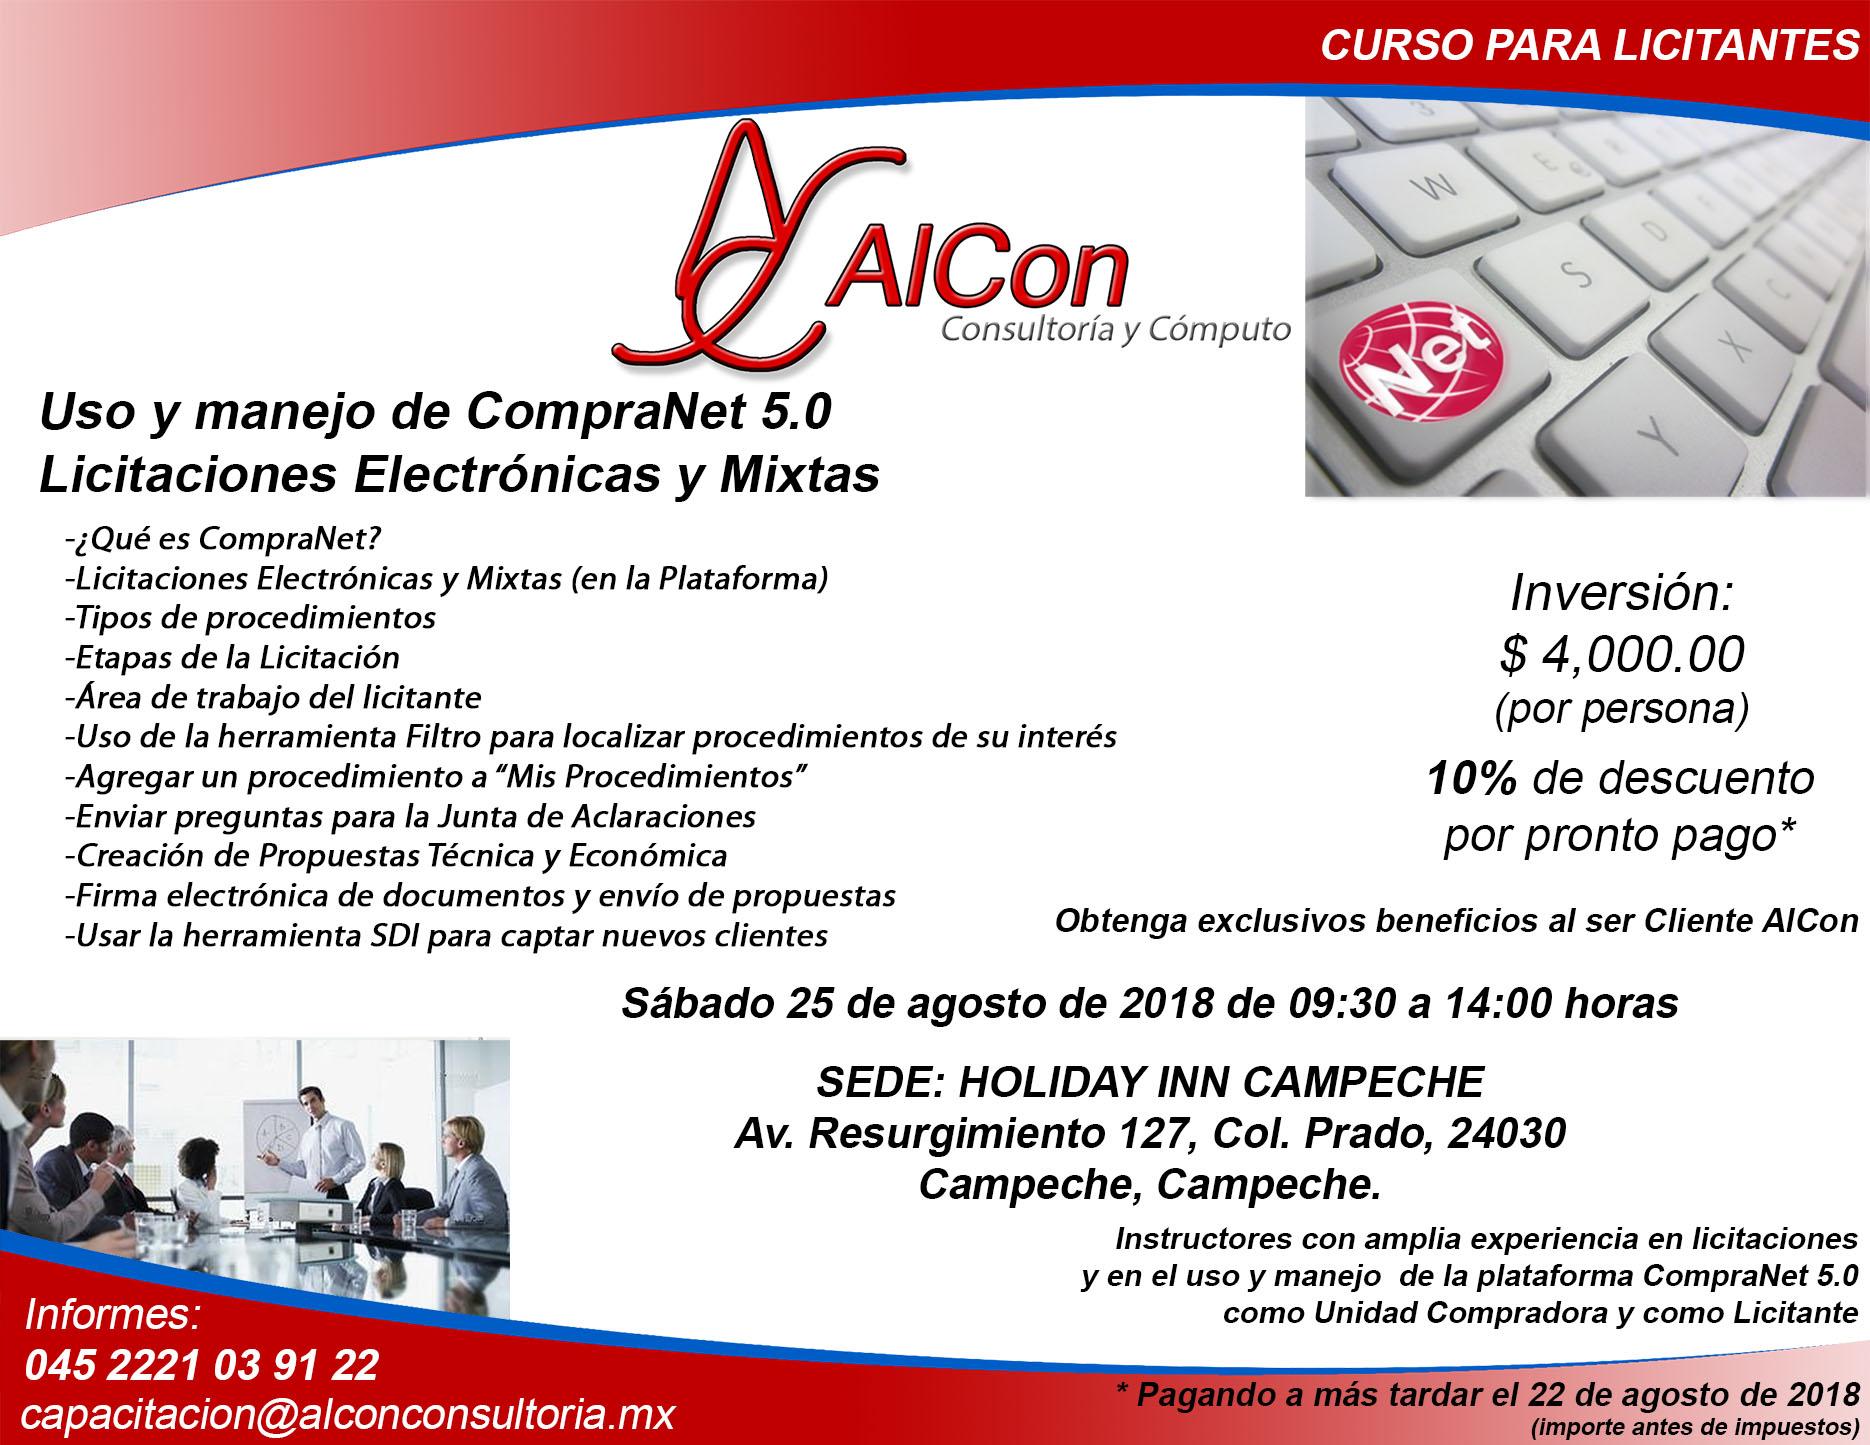 Curso CompraNet 5.0 Campeche